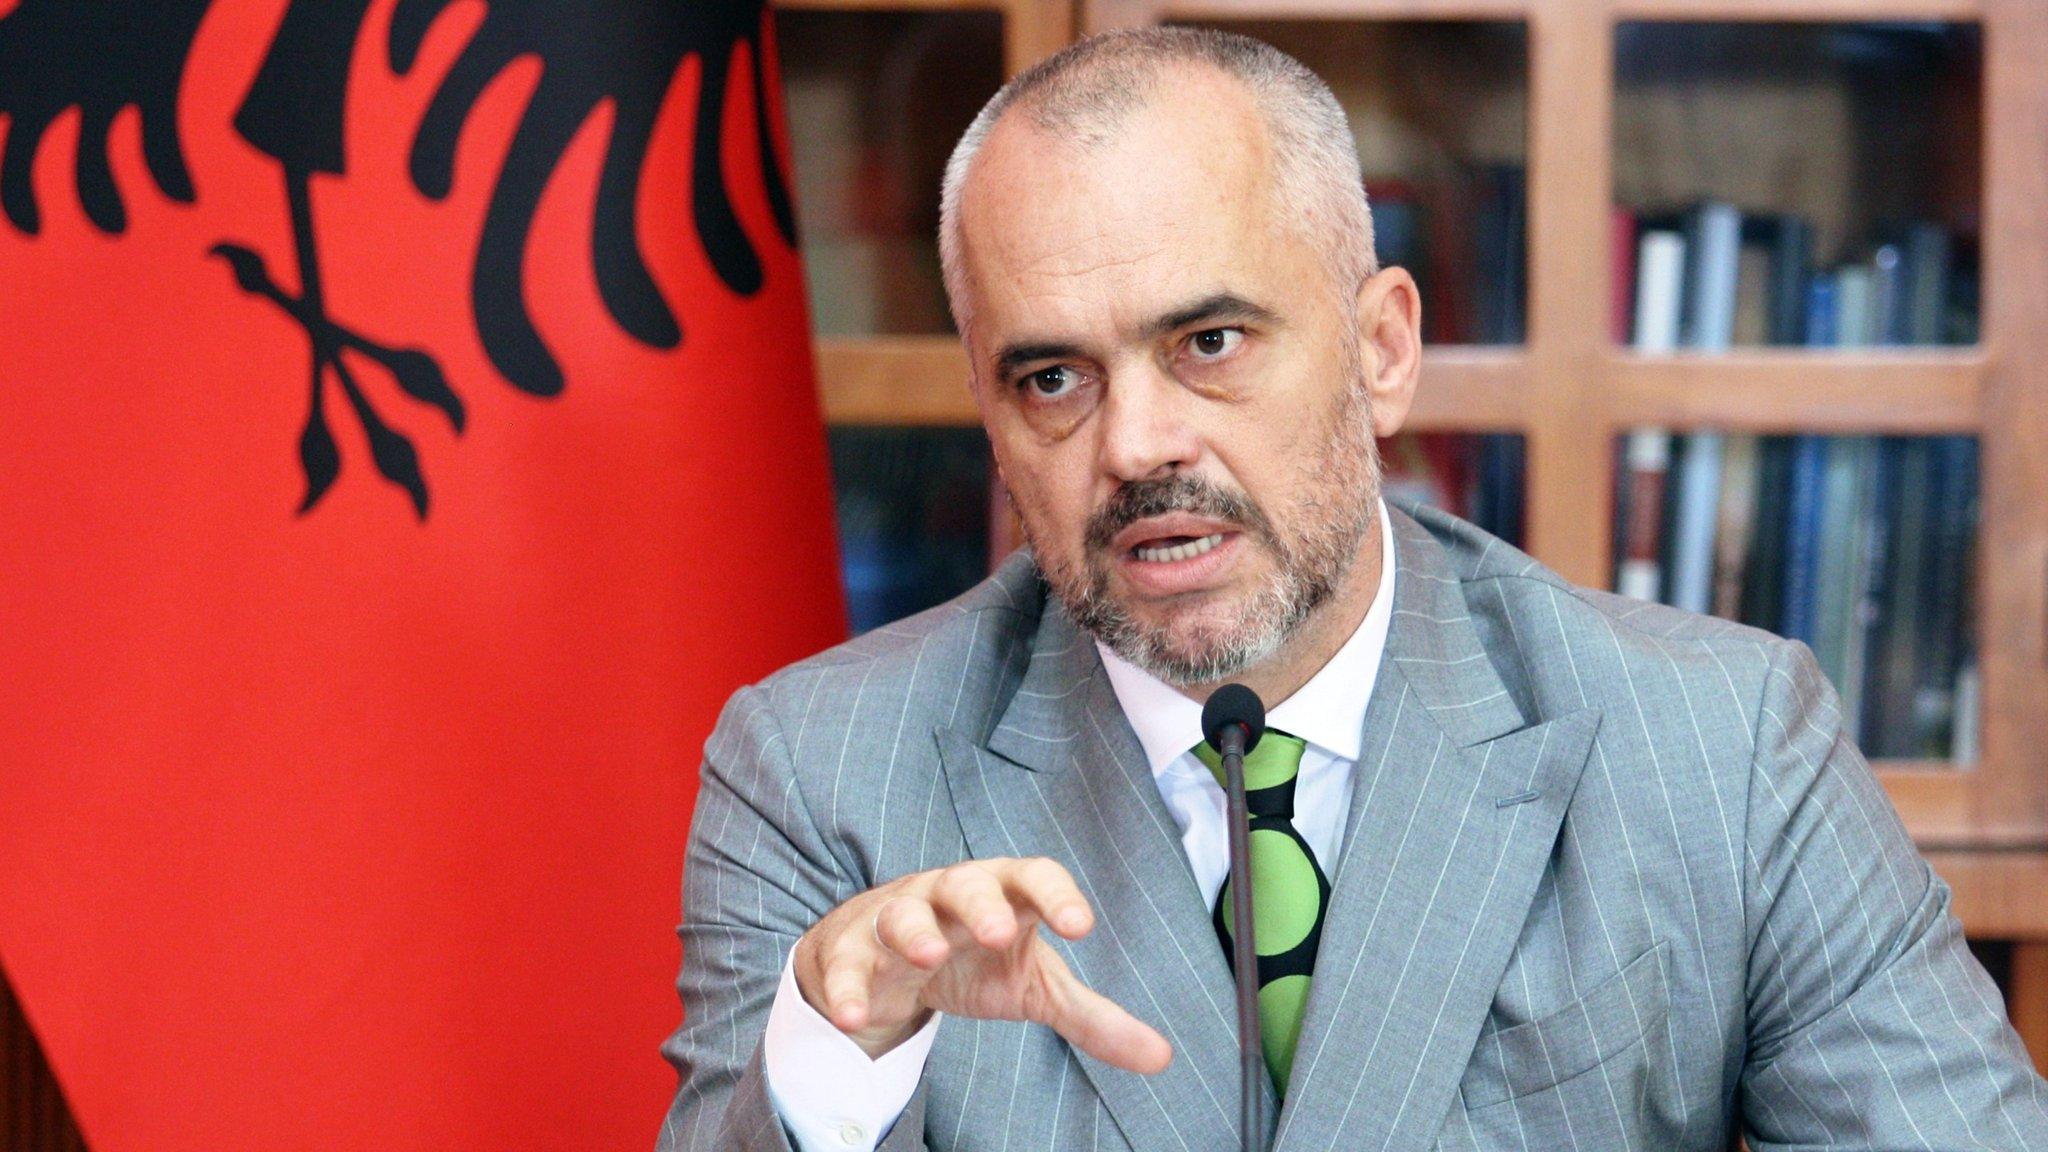 Rama: Το πρόβλημα είναι το πως λειτουργεί η ΕΕ κι όχι η Αλβανία ή τα Βαλκάνια